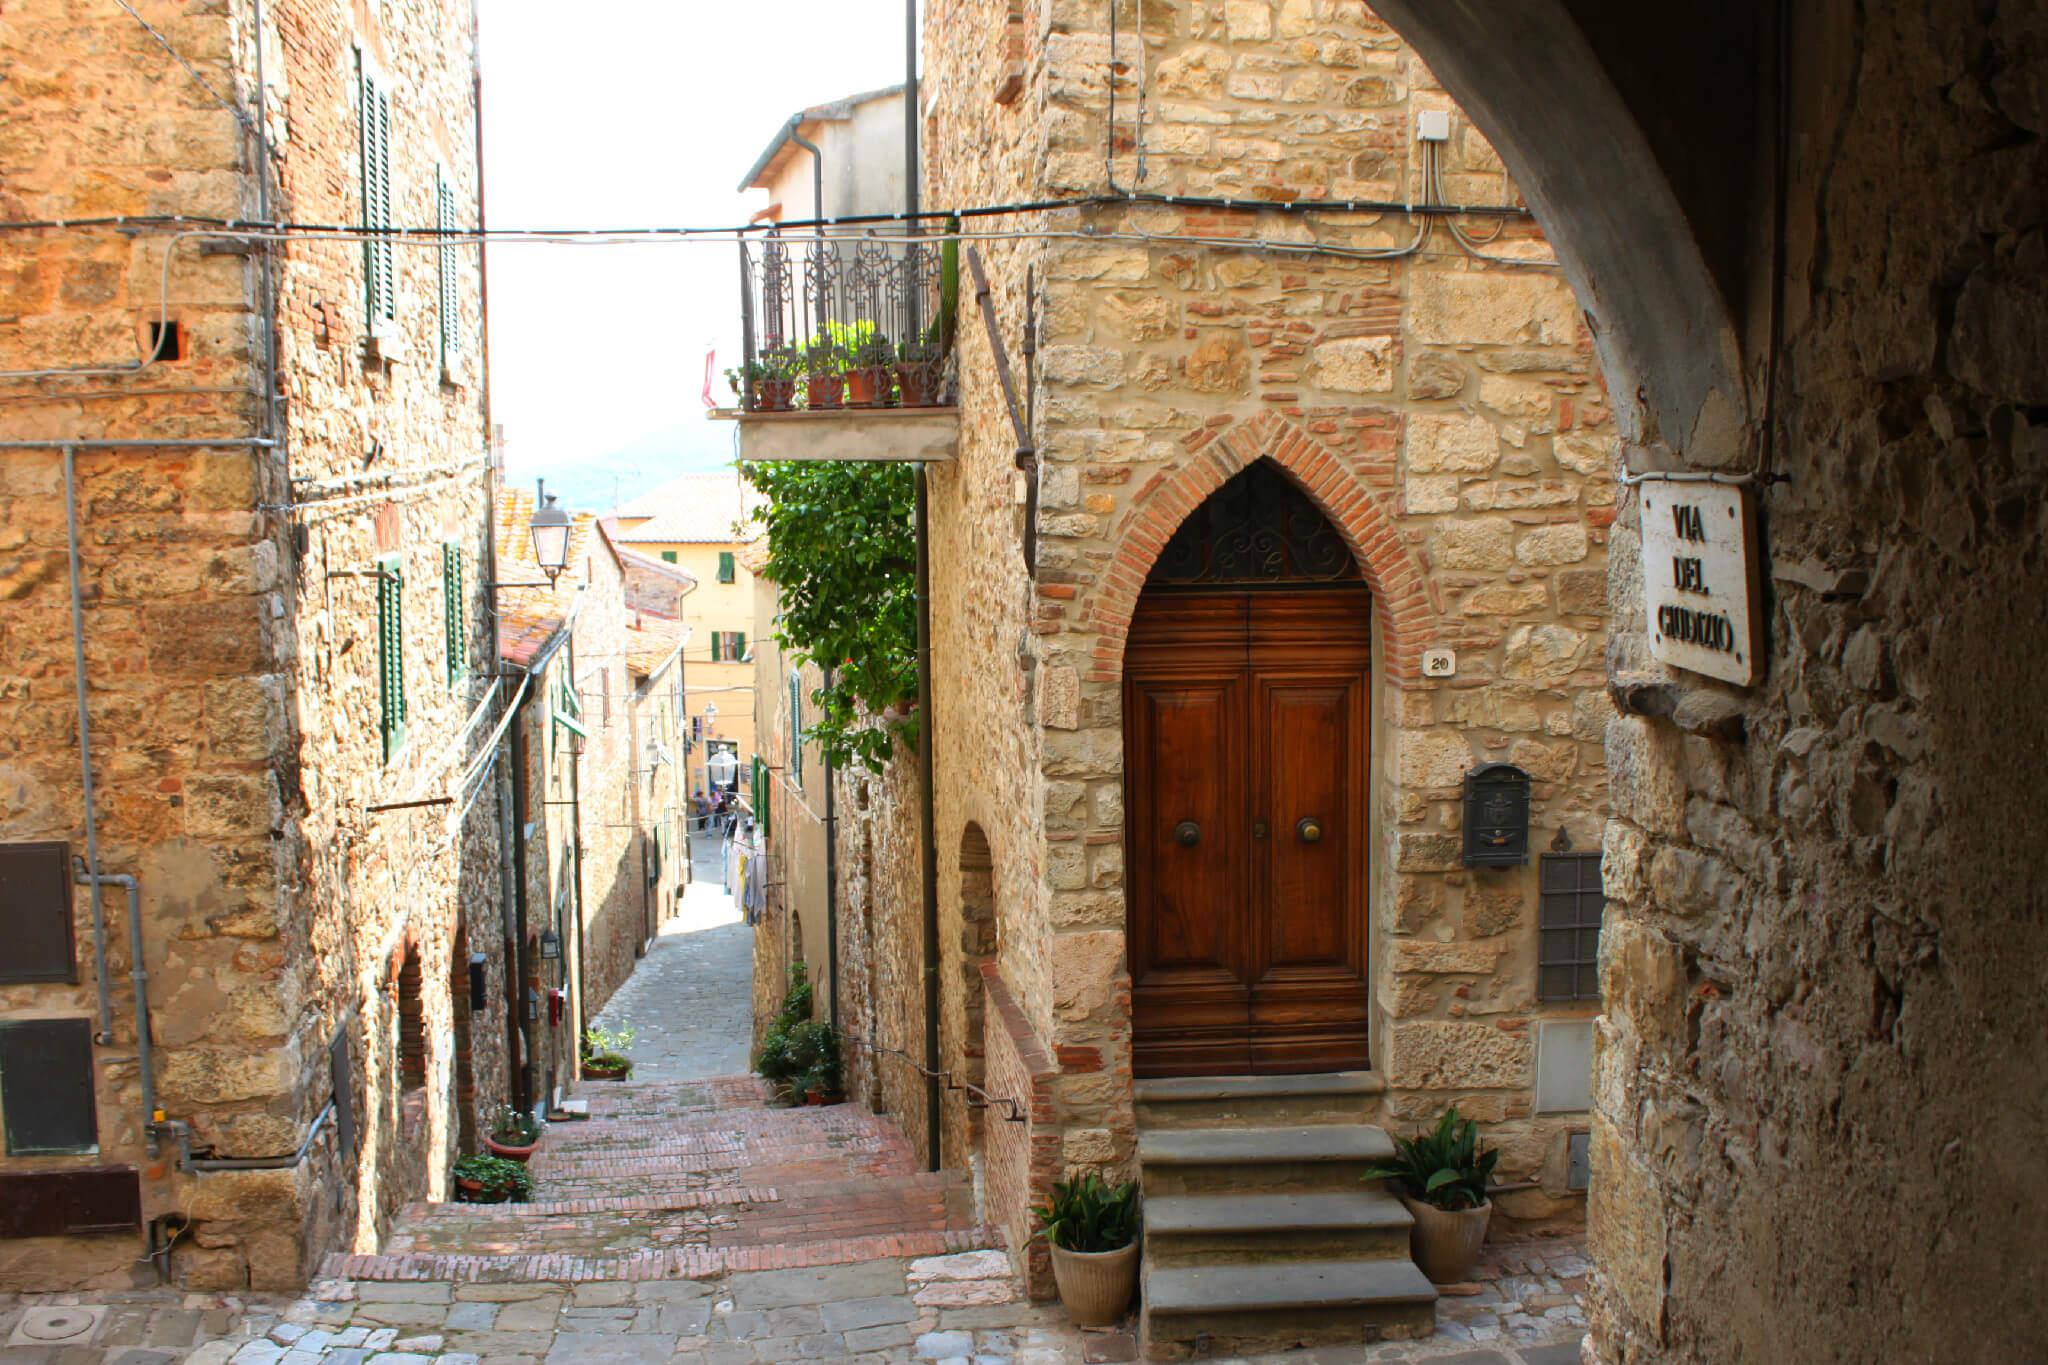 Borgo Of The Month Suvereto Tuscany Italy Magazine